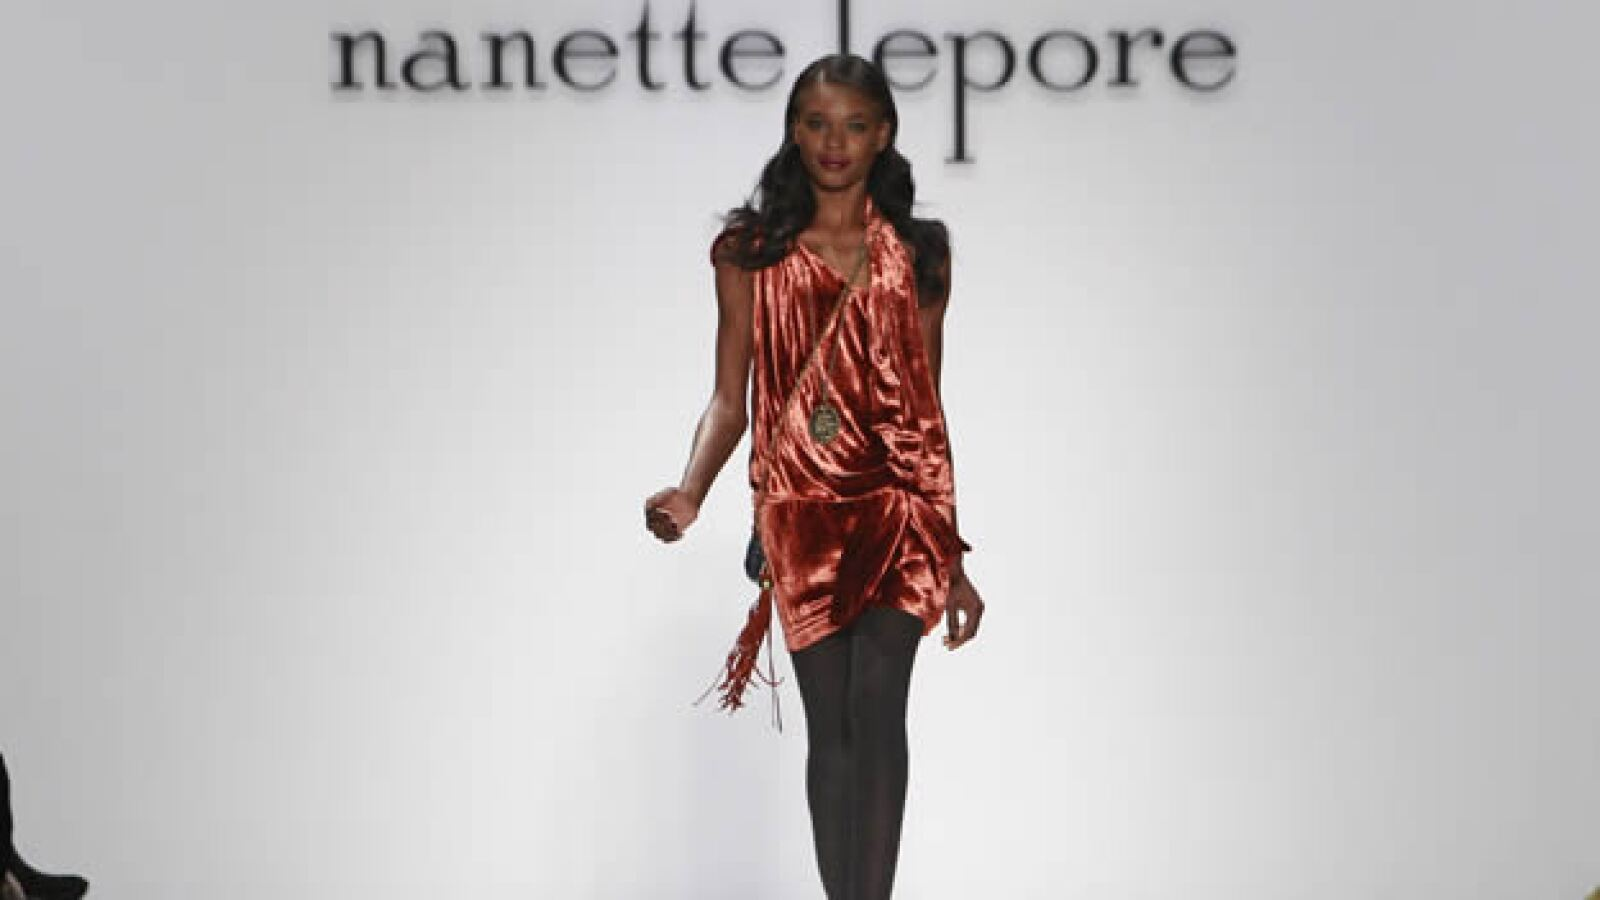 Nanette lepore fashion weeb nueva york